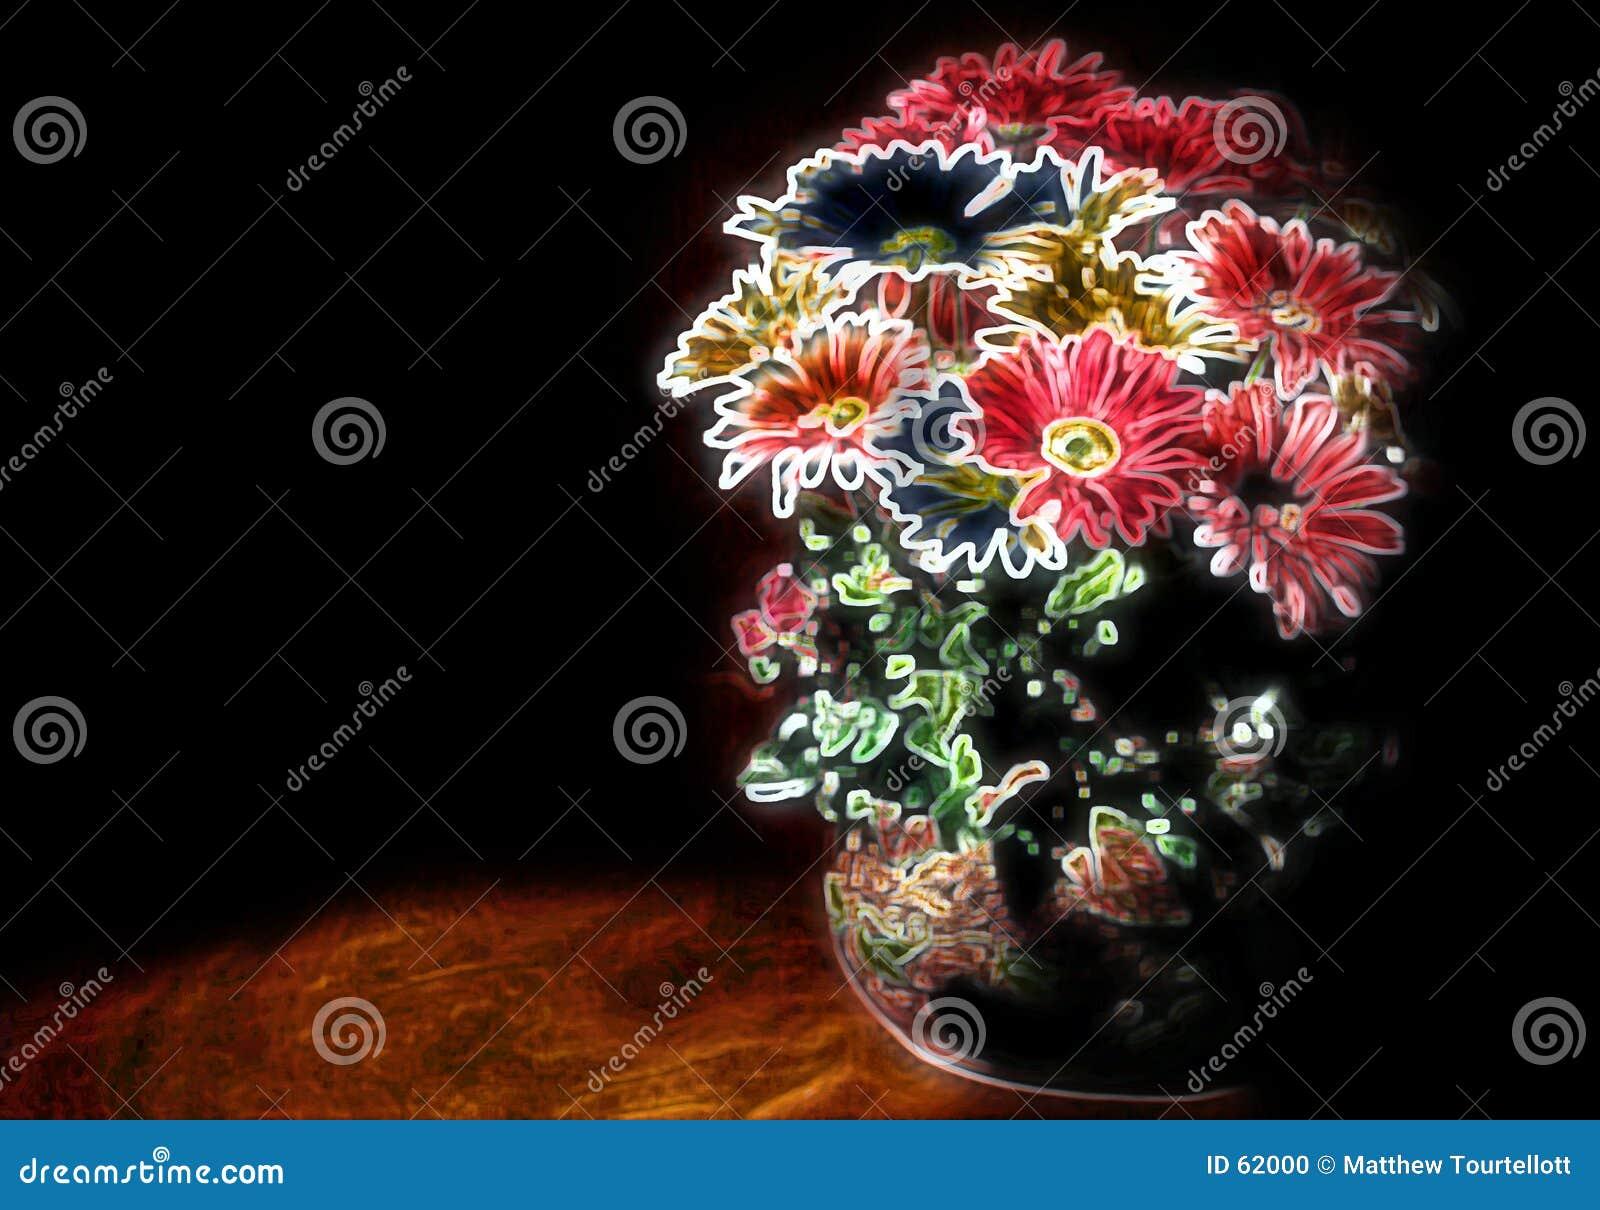 Download φως που χρωματίζεται στοκ εικόνες. εικόνα από floral, λουλούδια - 62000